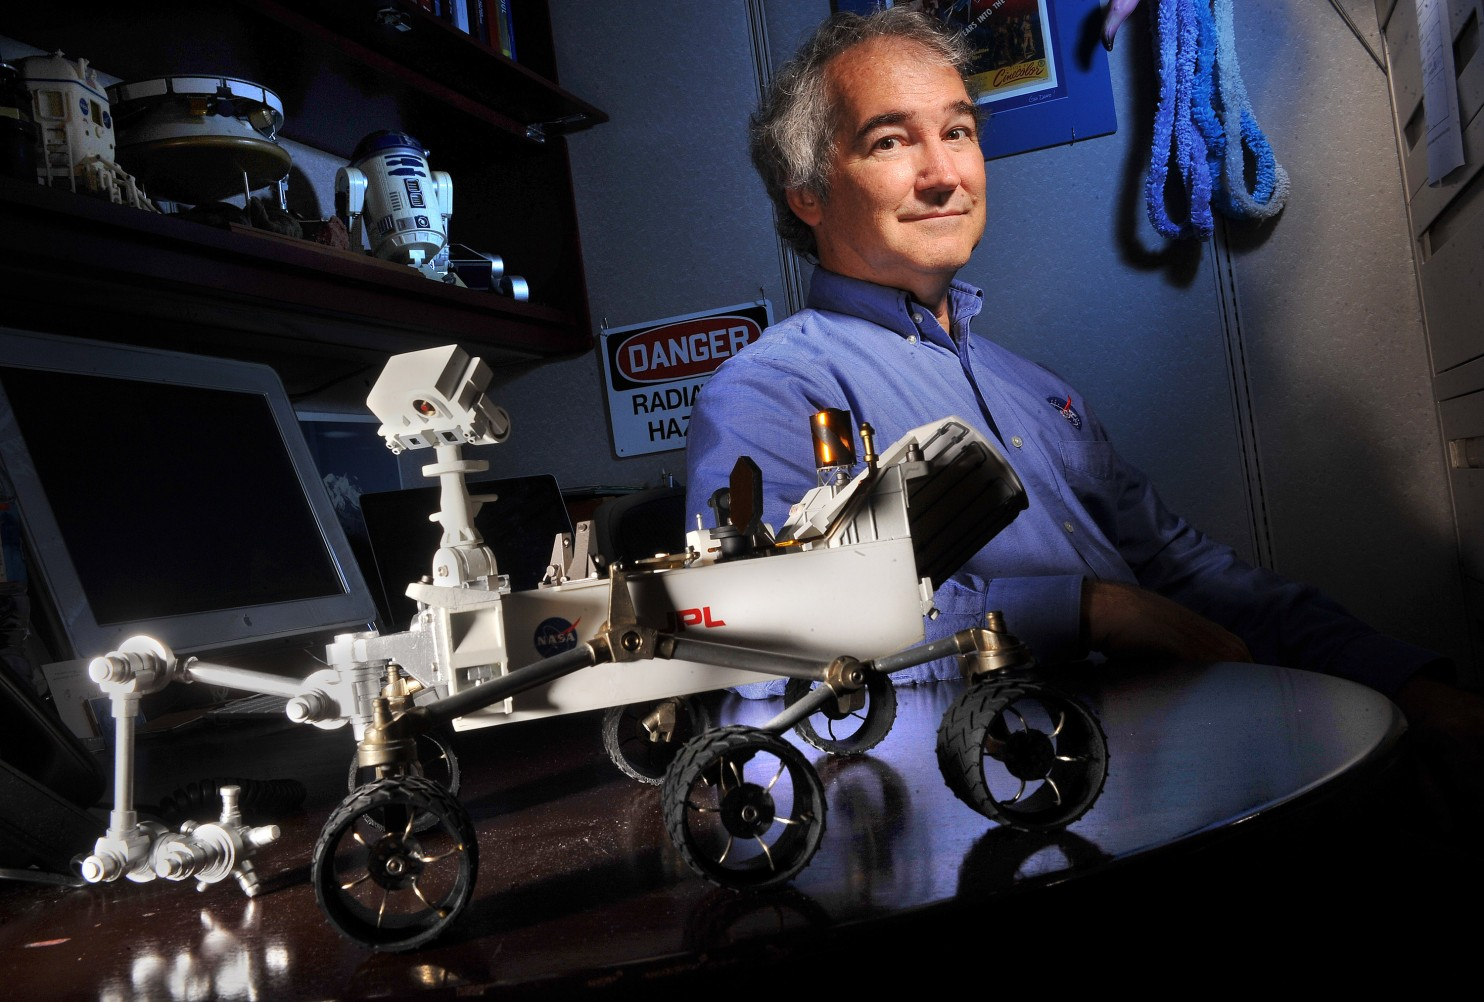 Head of NASA's Mars Rover program Dave Lavery to Speak at USPTO Veterans Day Celebration on November 10th